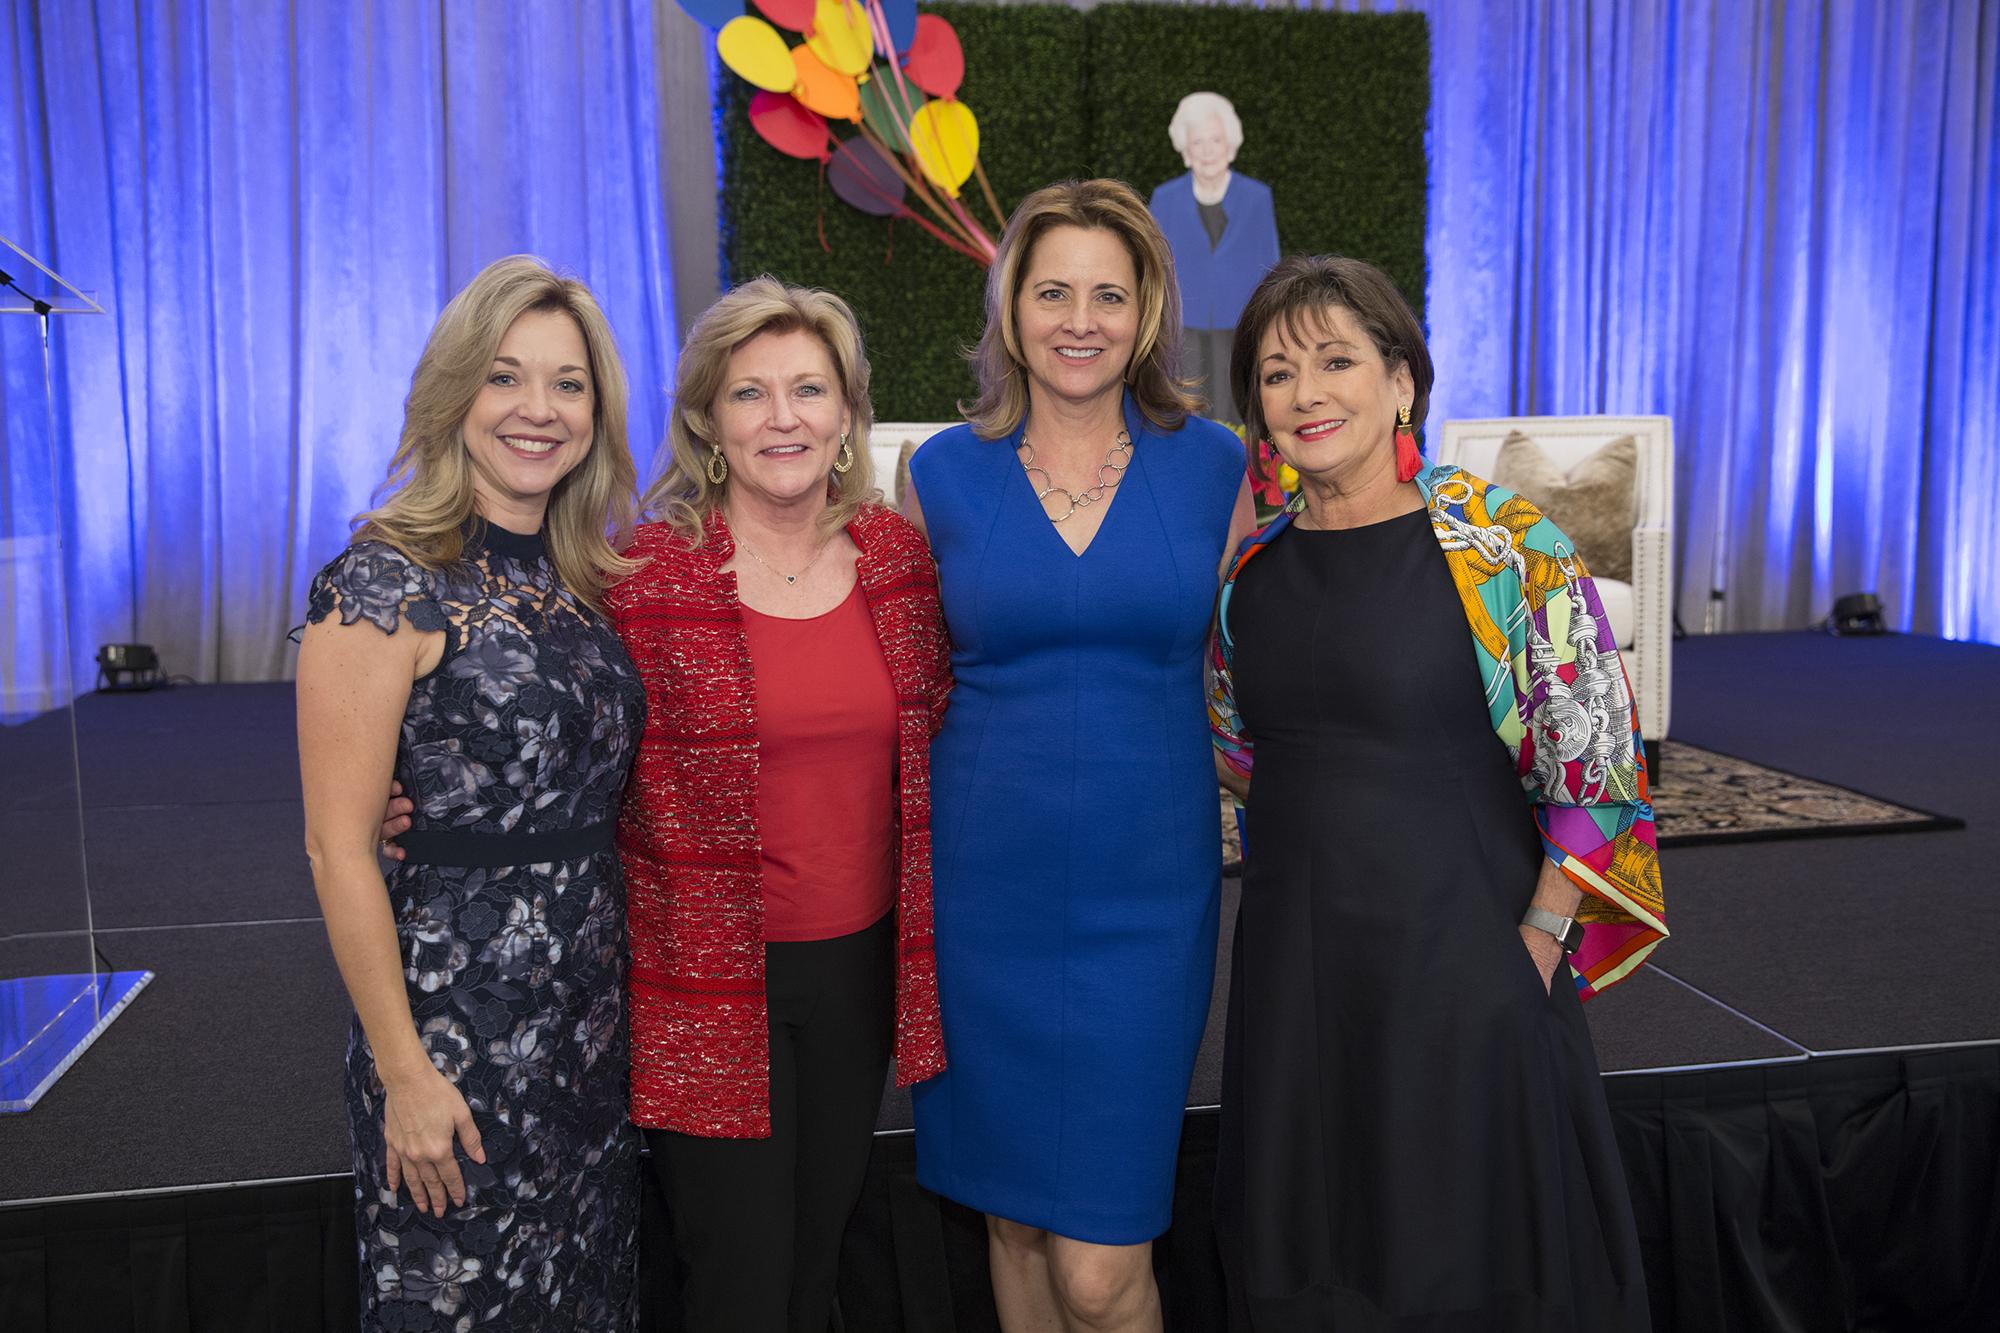 Julie Baker Finck, Rhonda Graff, Laurel D'Antoni, Cathy Cleary; Photo by Jenny Antill.jpg